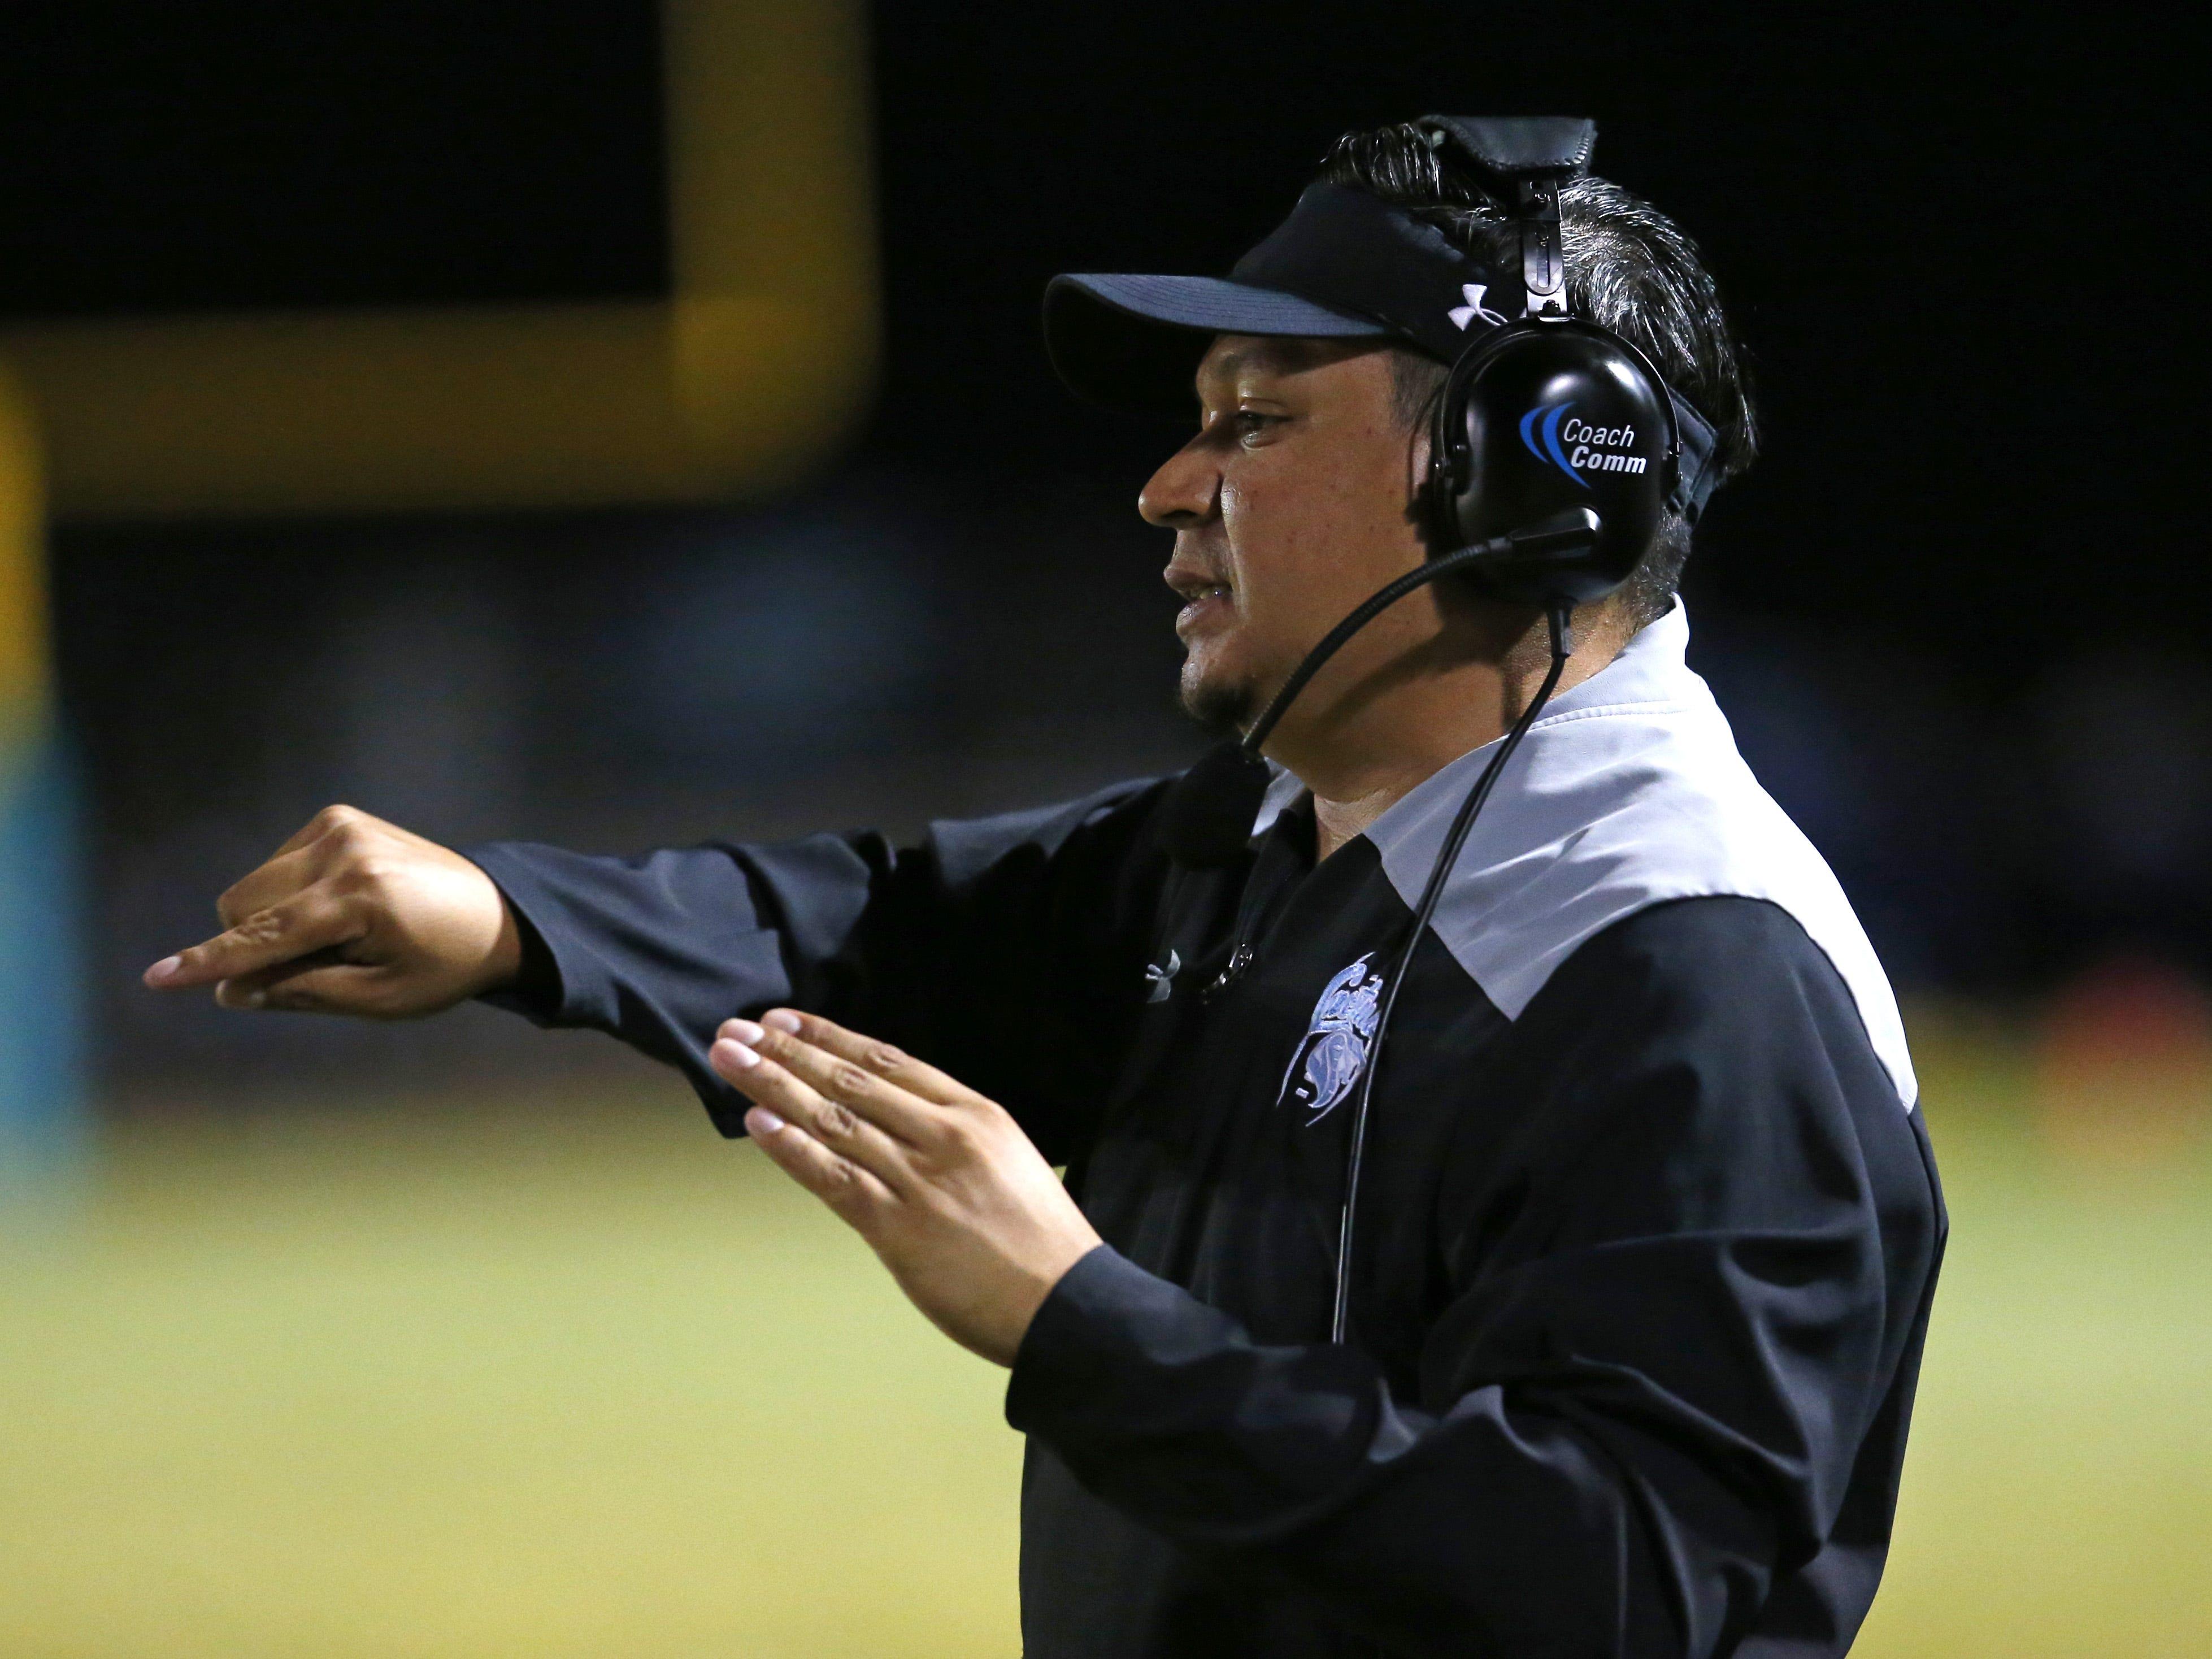 Cactus head coach Joseph Ortiz signals to his team during a football game against the Peoria at Peoria High on October 26. #azhsfb